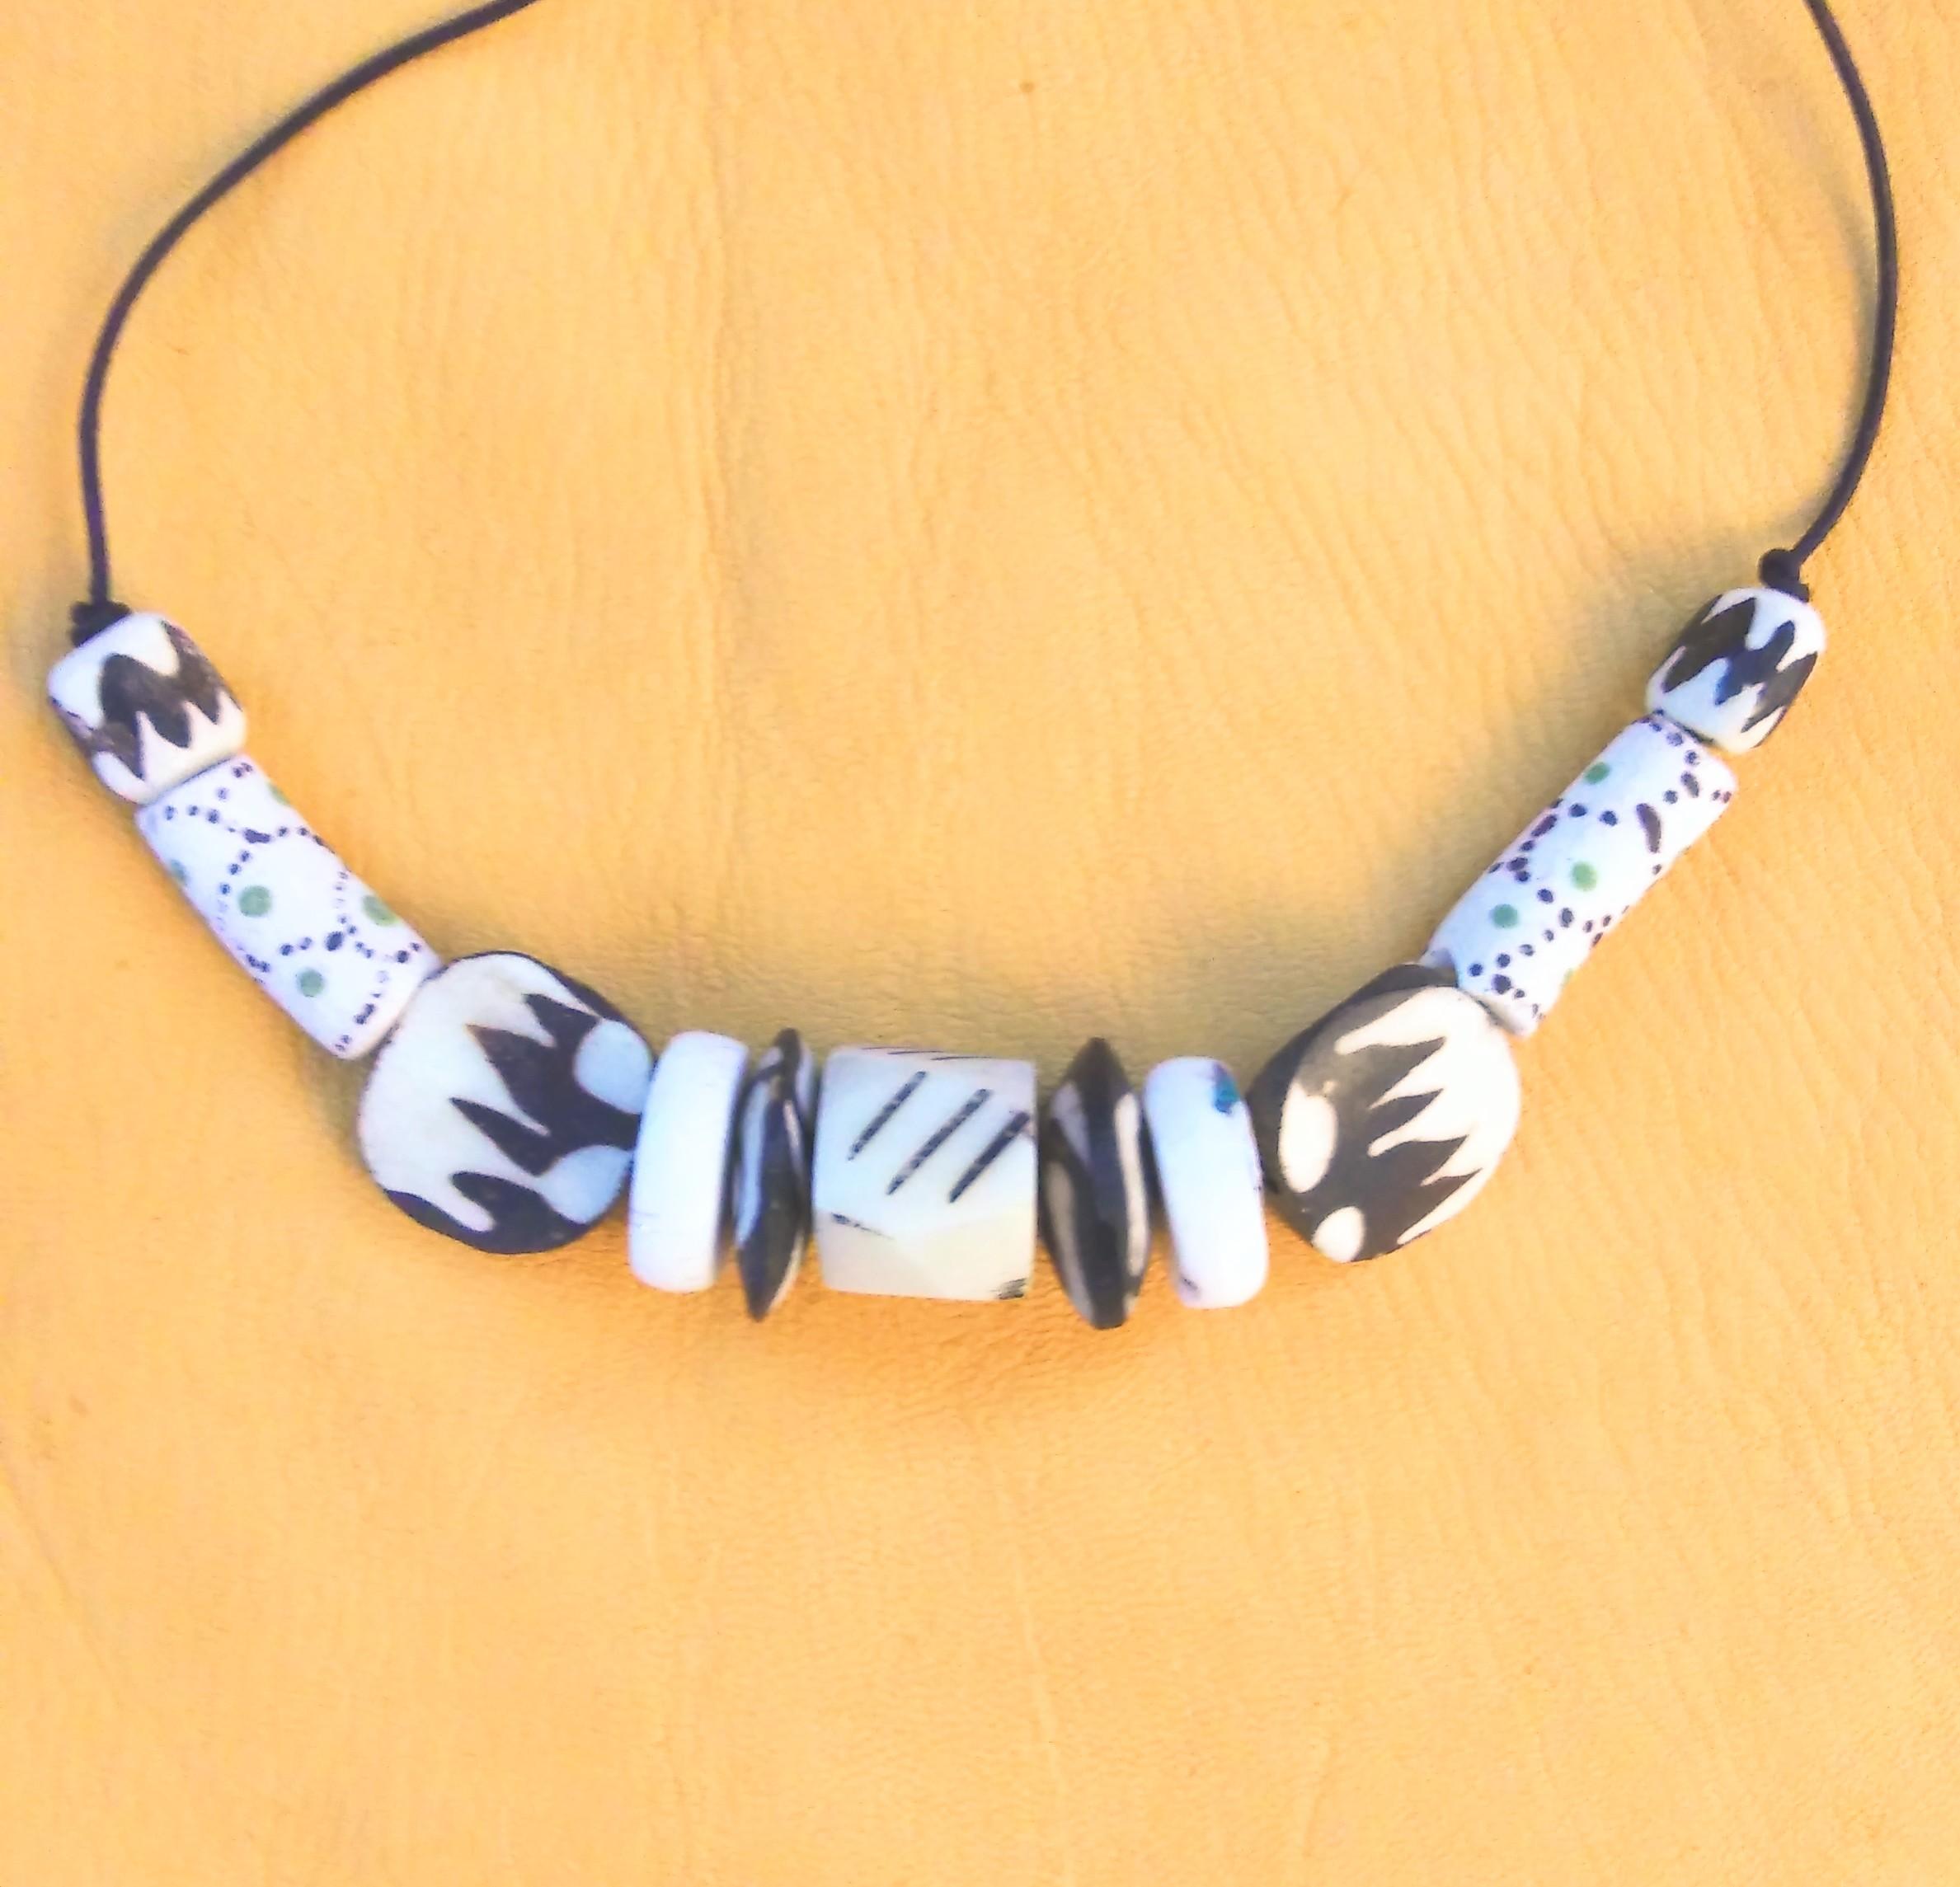 bone trade beads, shaman charm, tribal jewelry